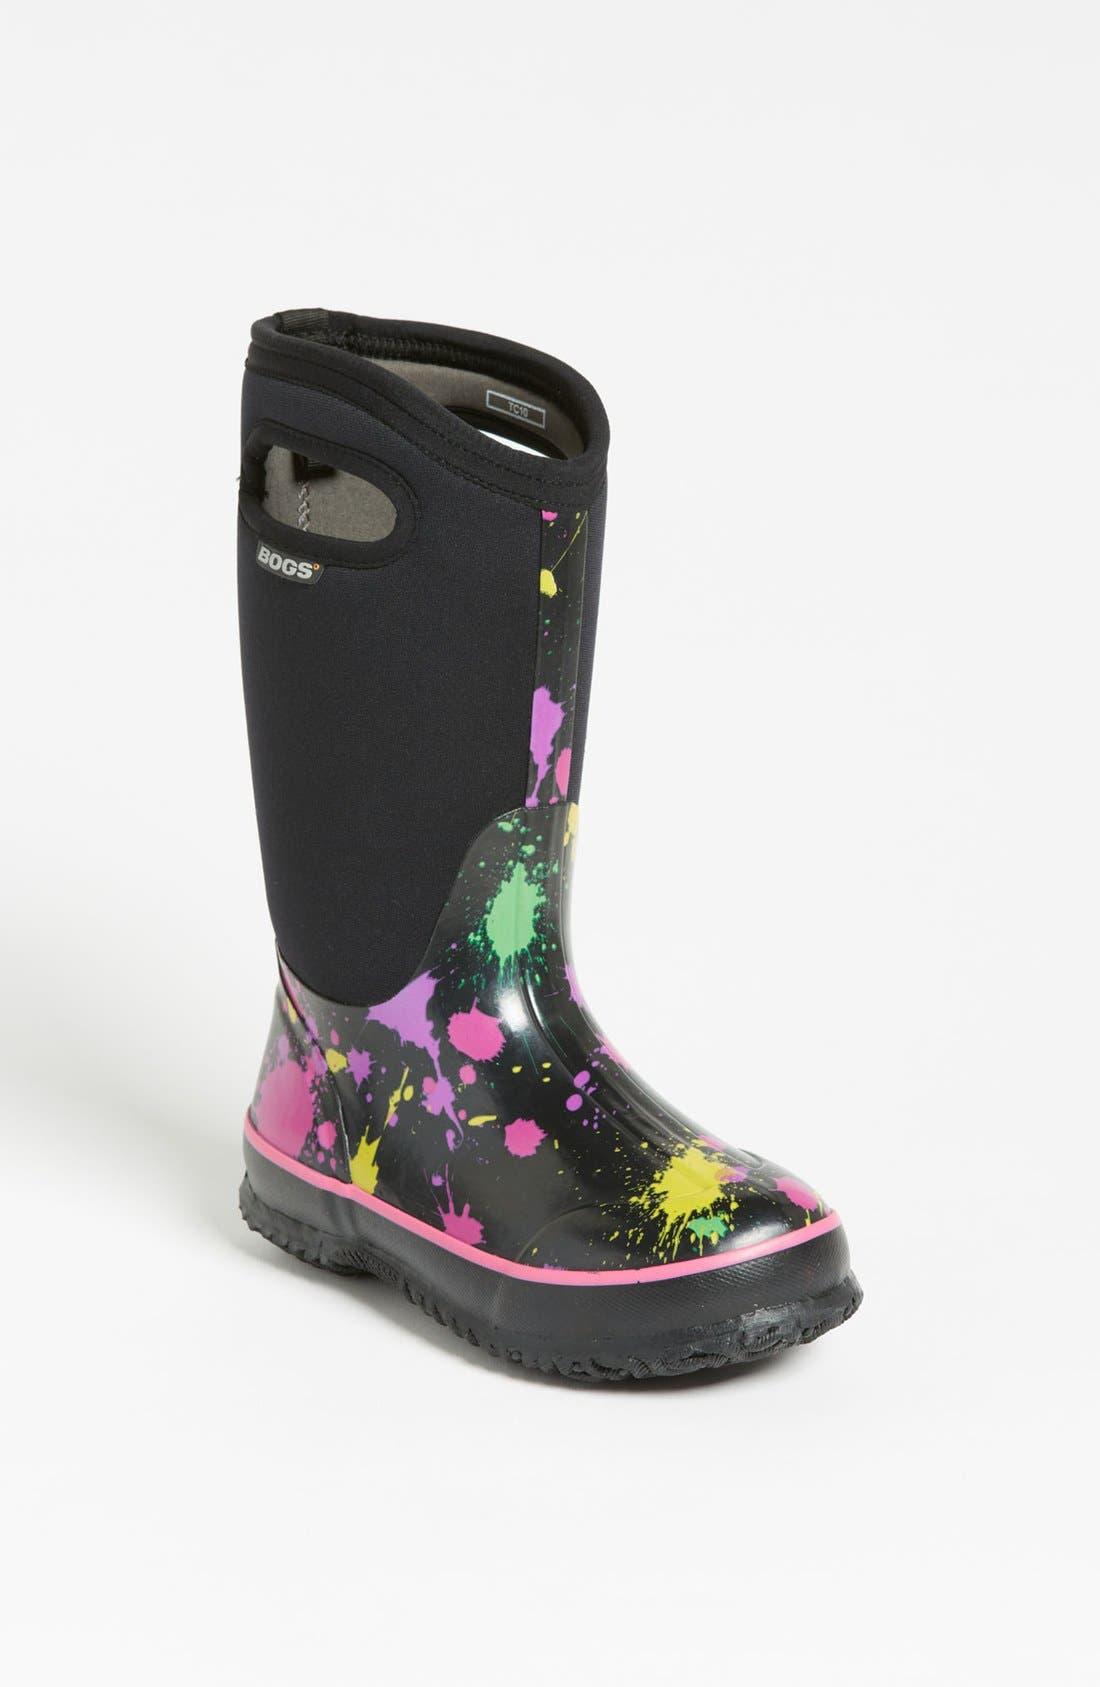 Alternate Image 1 Selected - Bogs 'Classic High - Paint Splat' Waterproof Boot (Toddler, Little Kid & Big Kid)